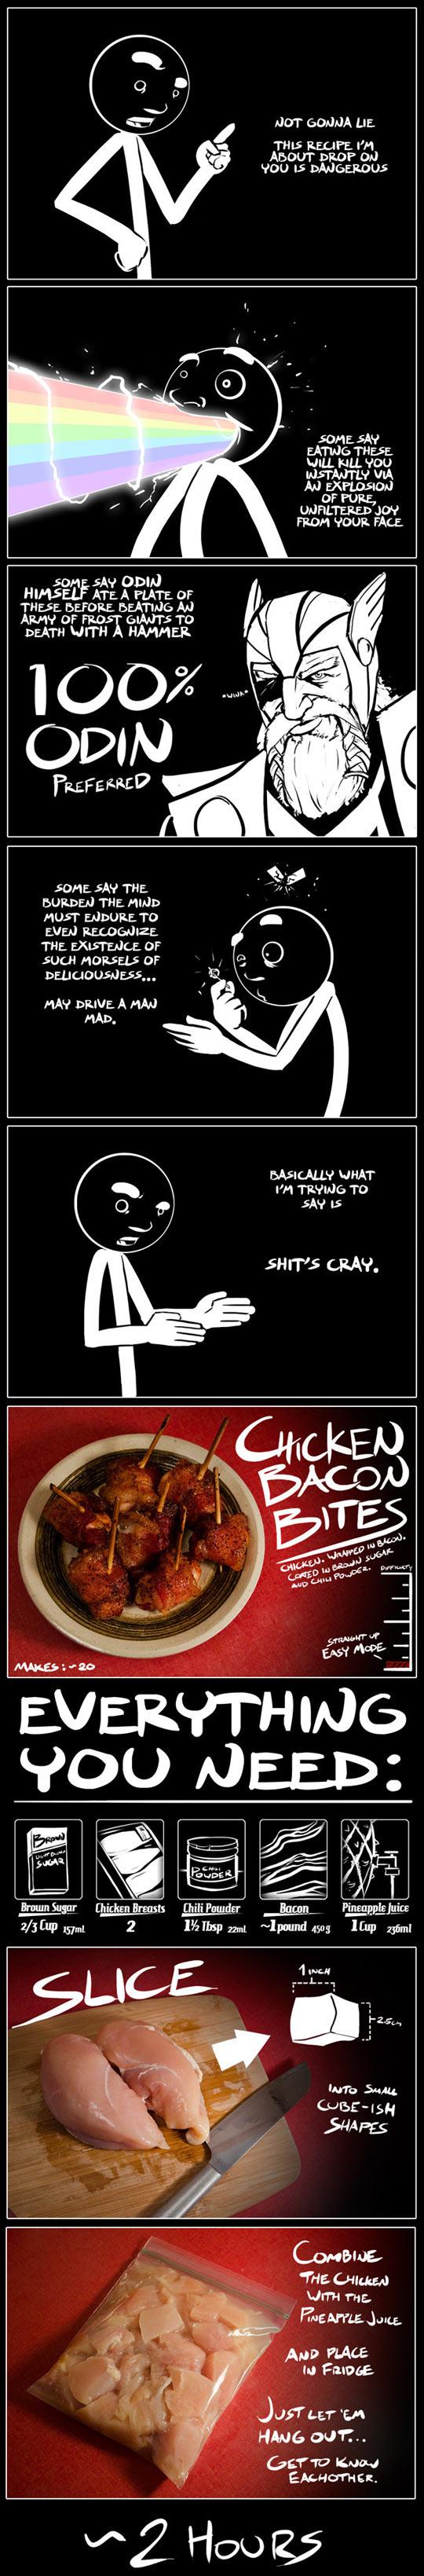 funny-explain-chicken-bacon-food-recipe